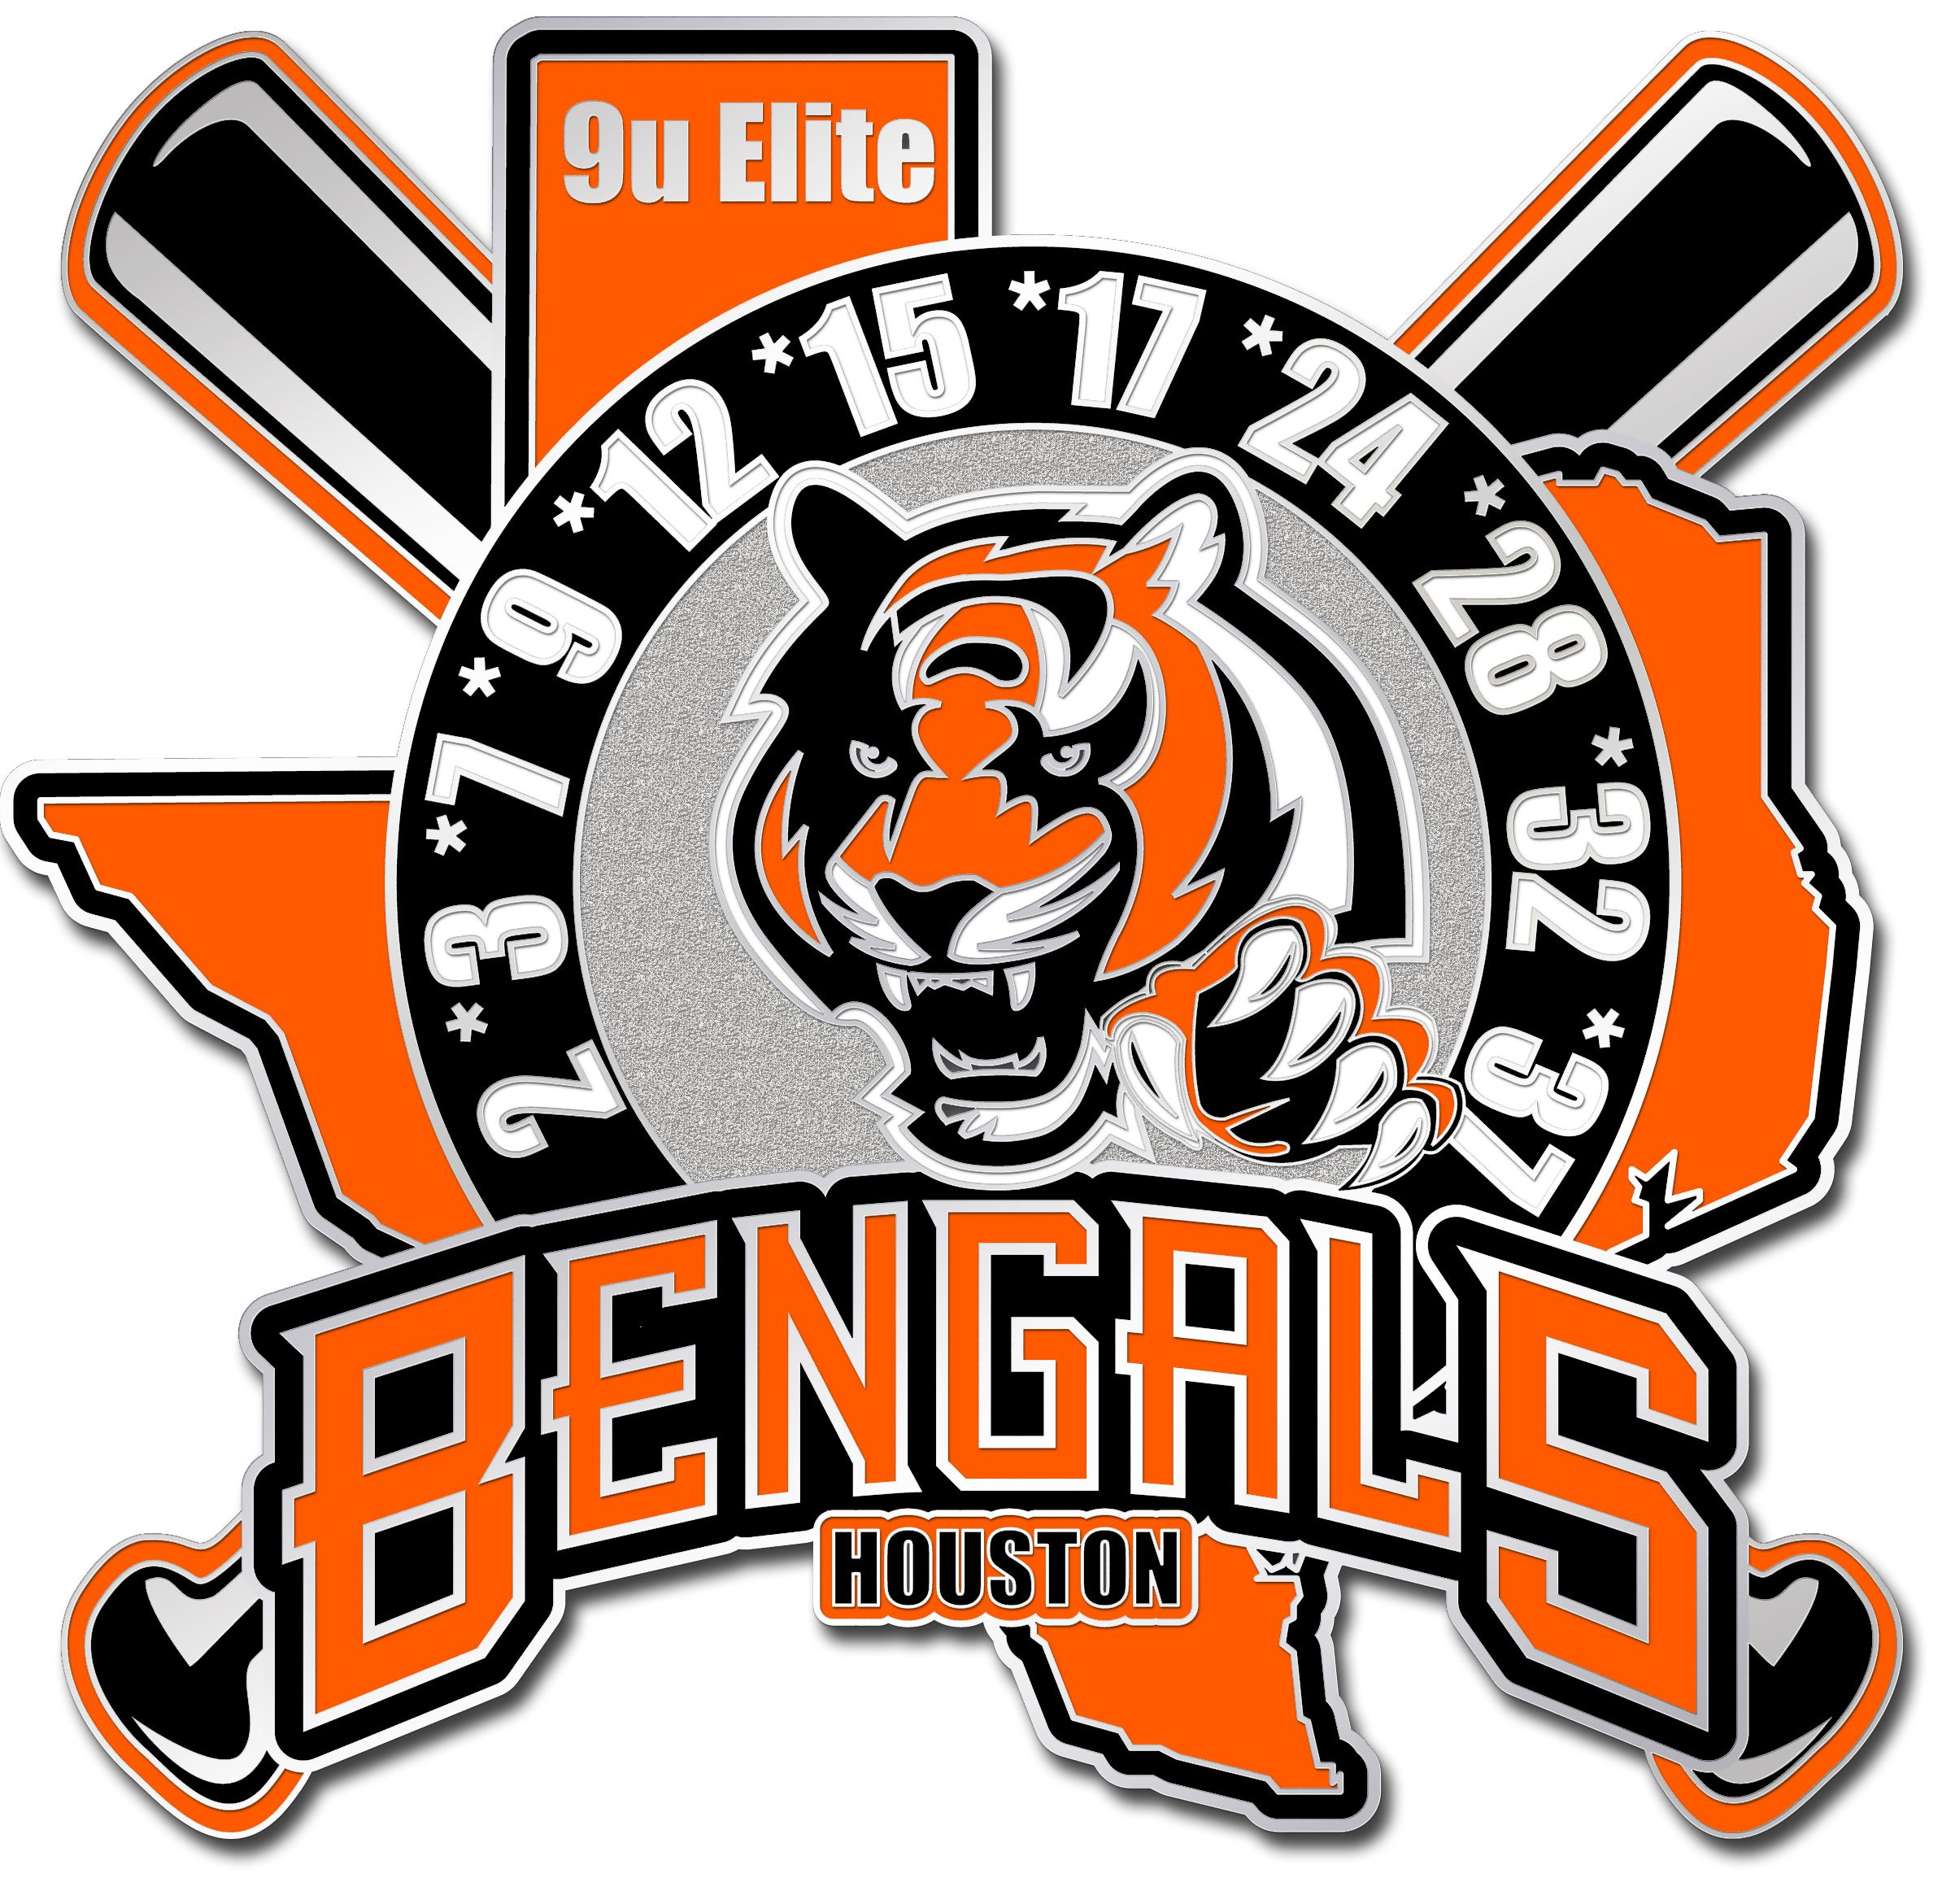 Houston Bengals Sport team logos, Team logo, Cleveland